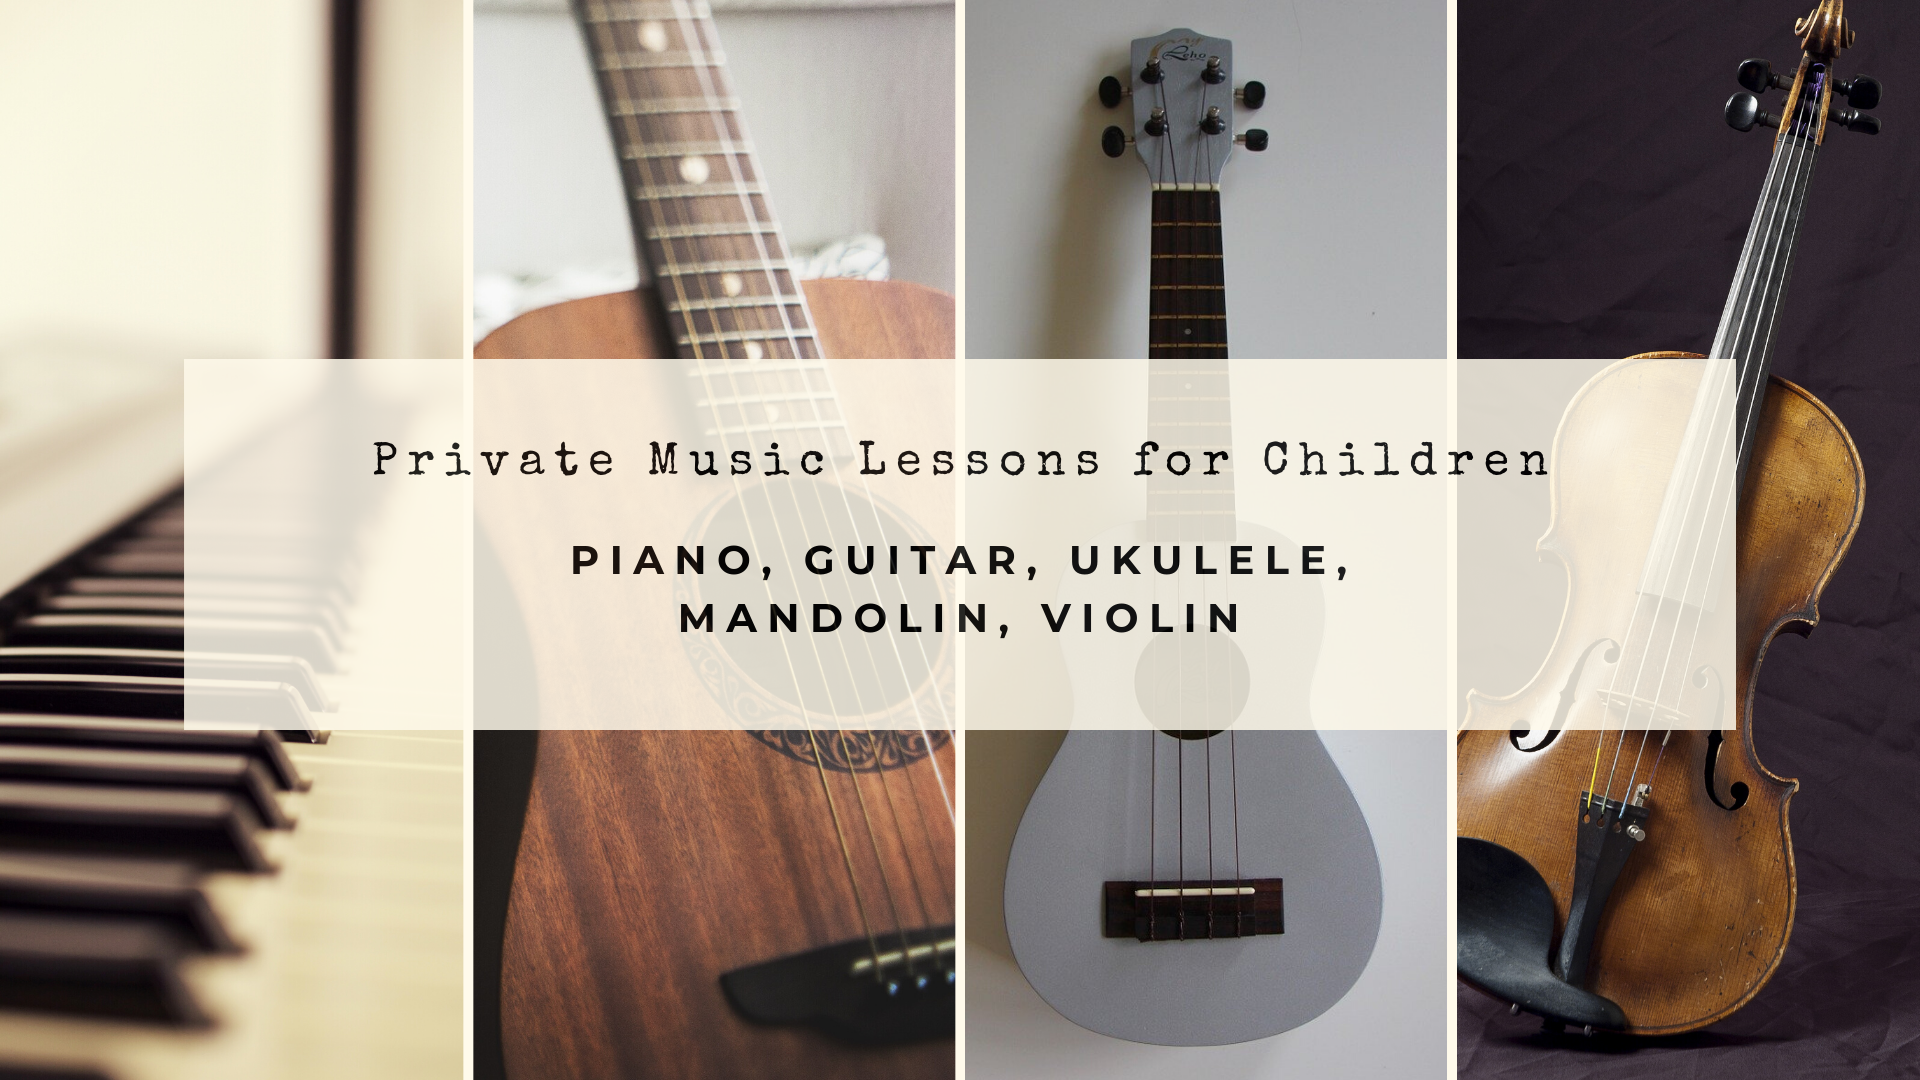 Private Music Lessons for Children